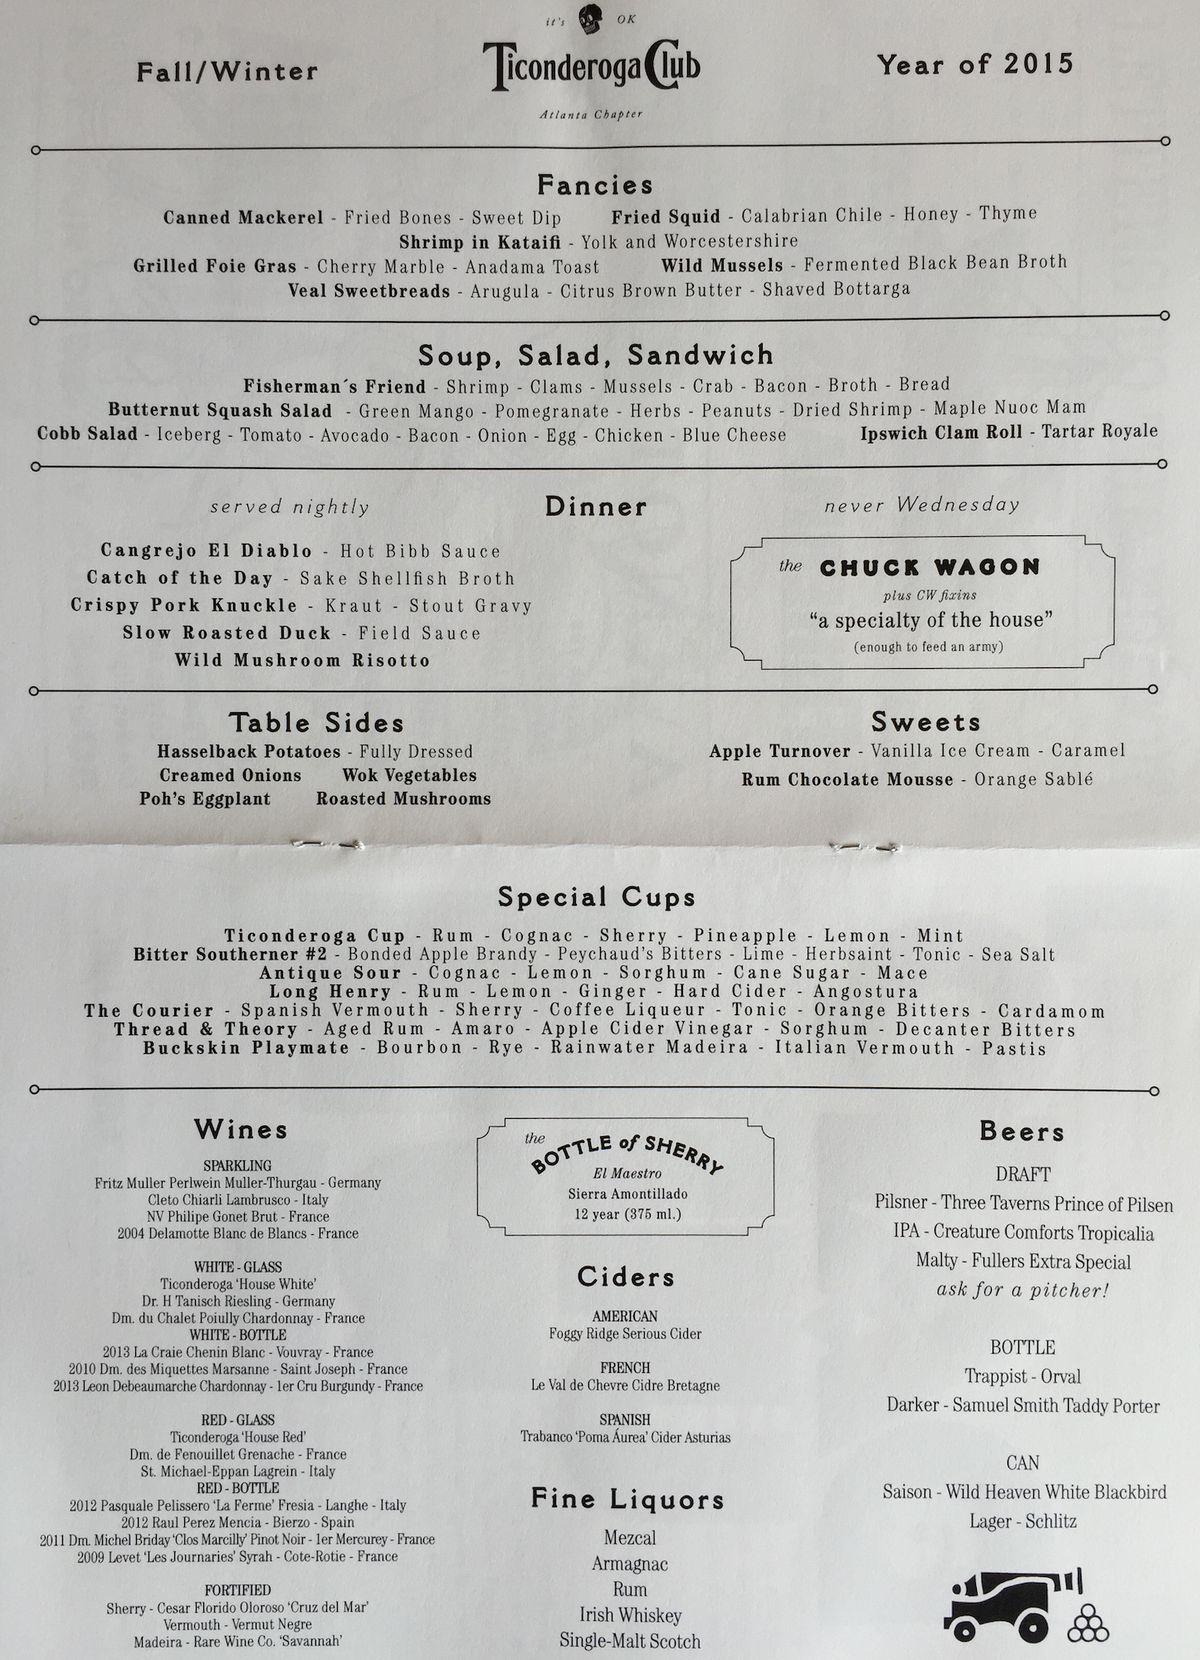 Ticonderoga Club menu